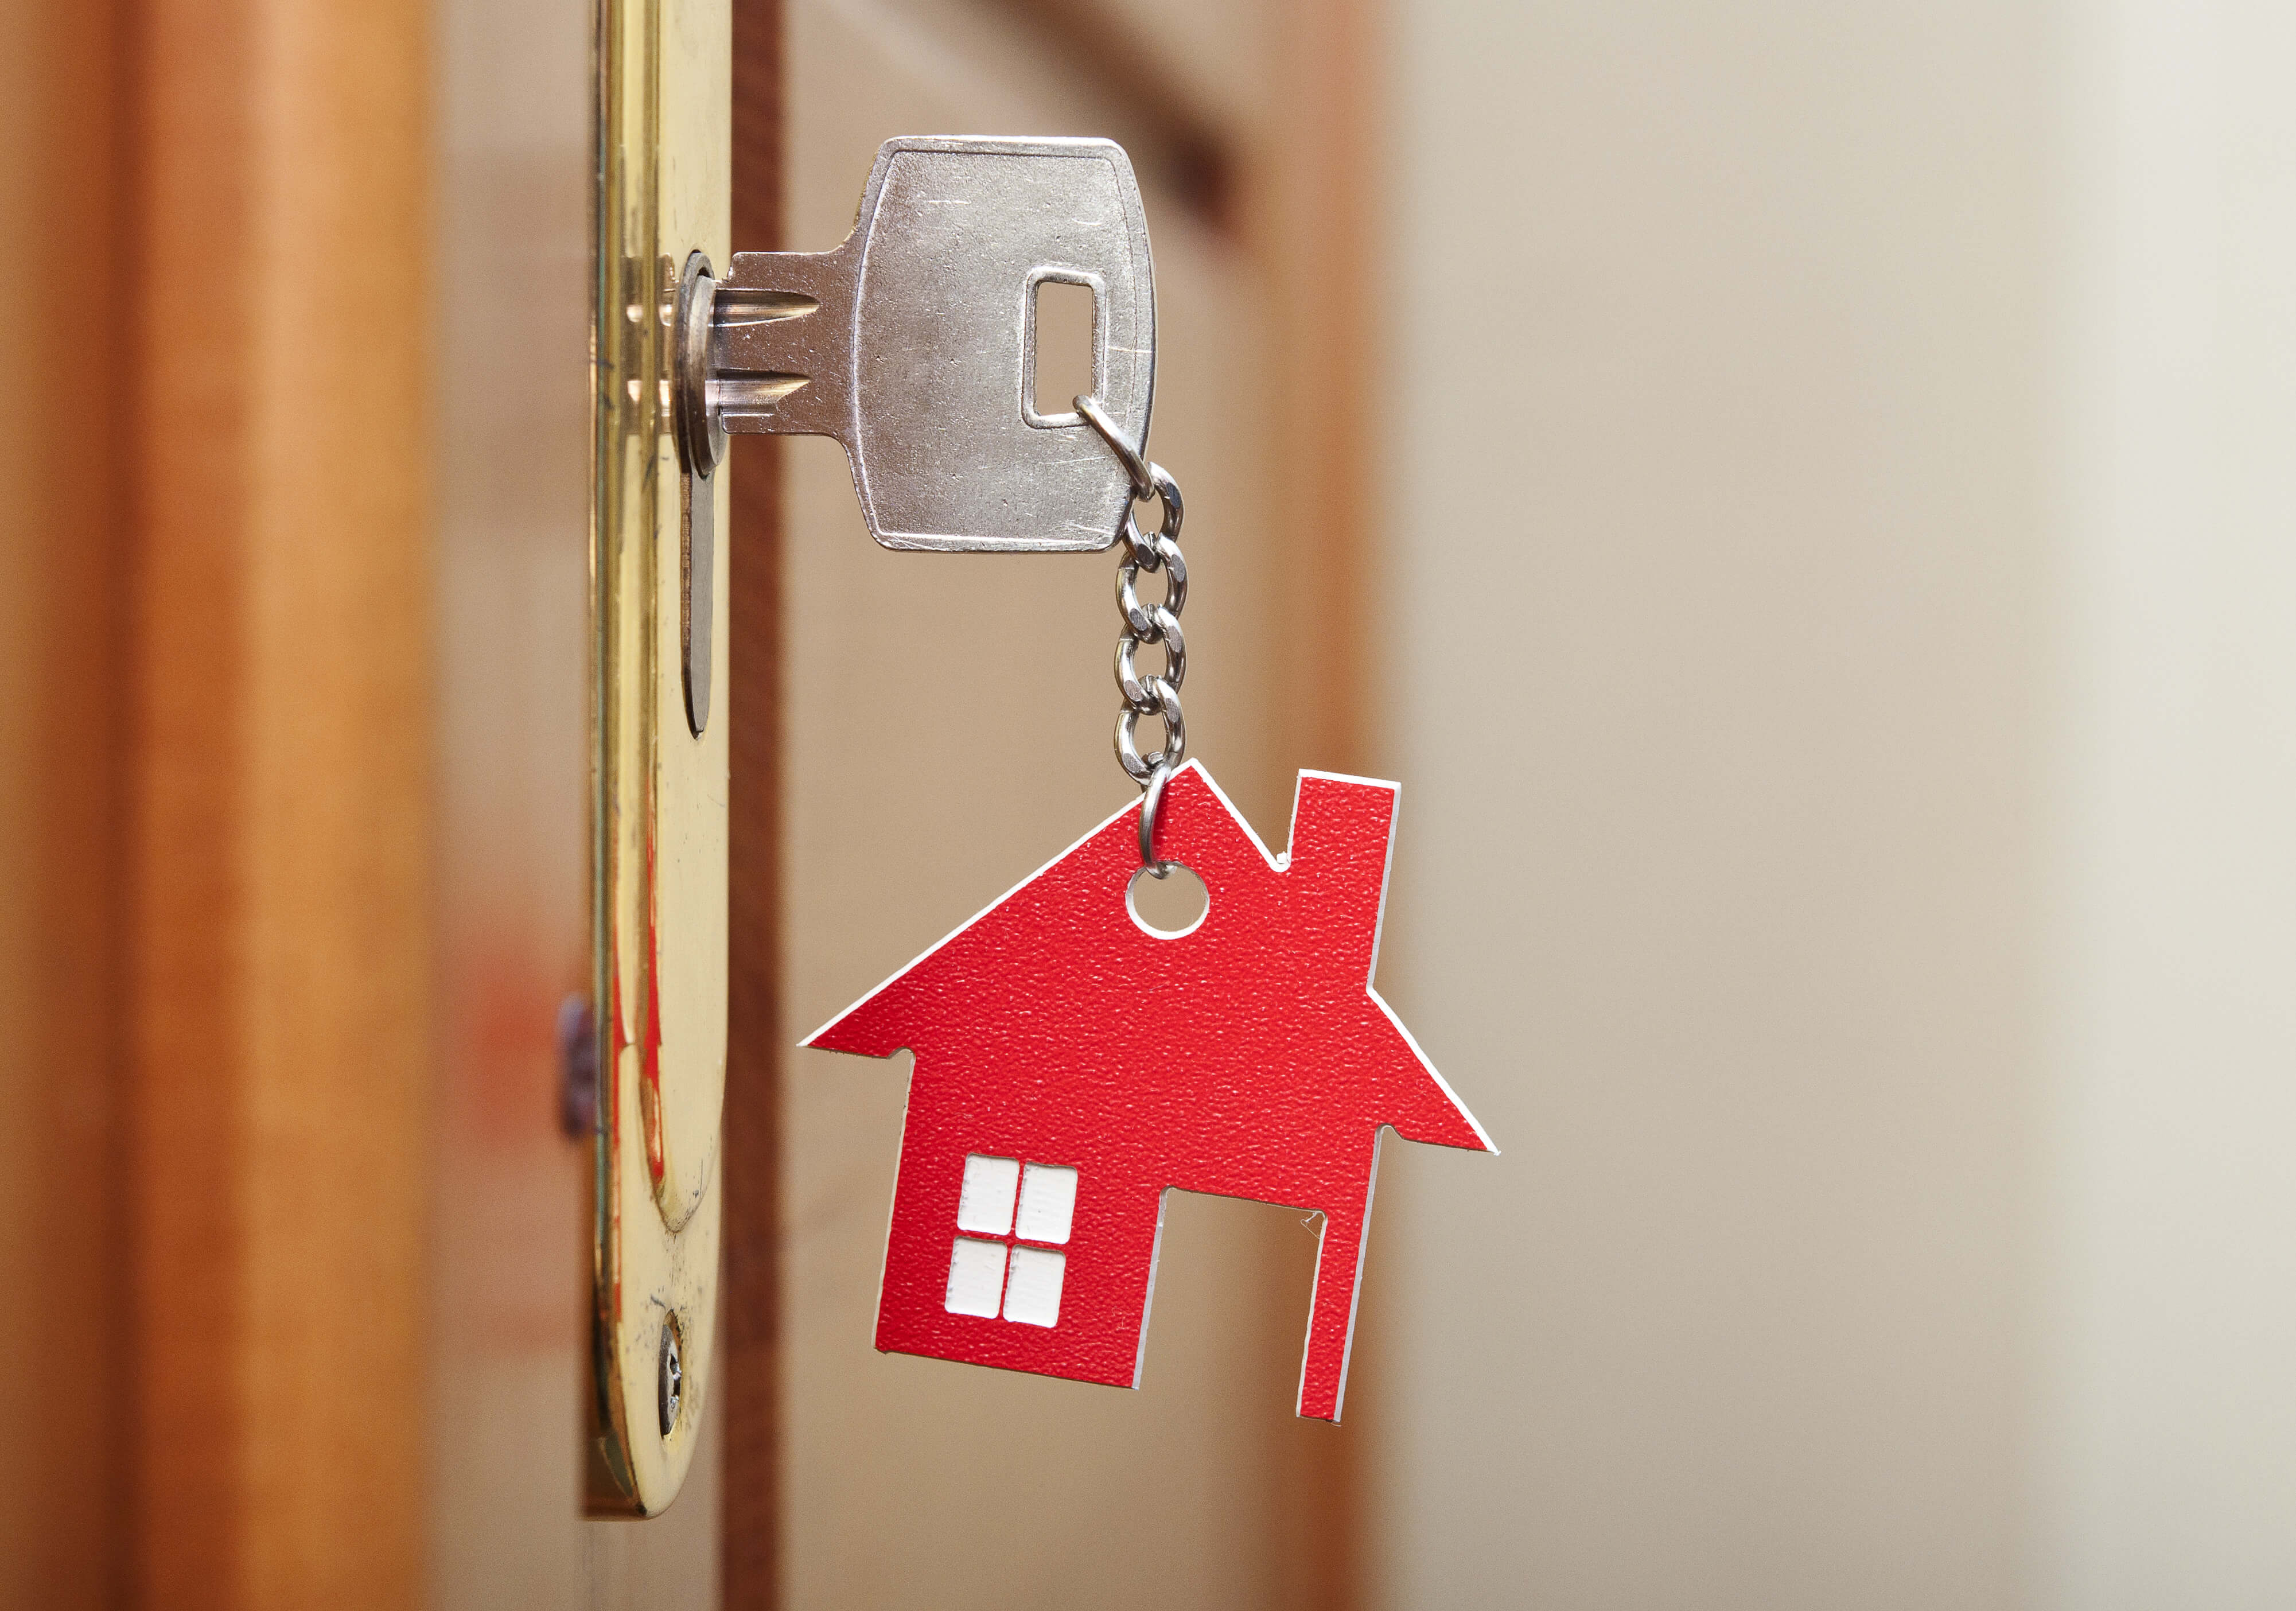 Residential Locksmith Plano TX